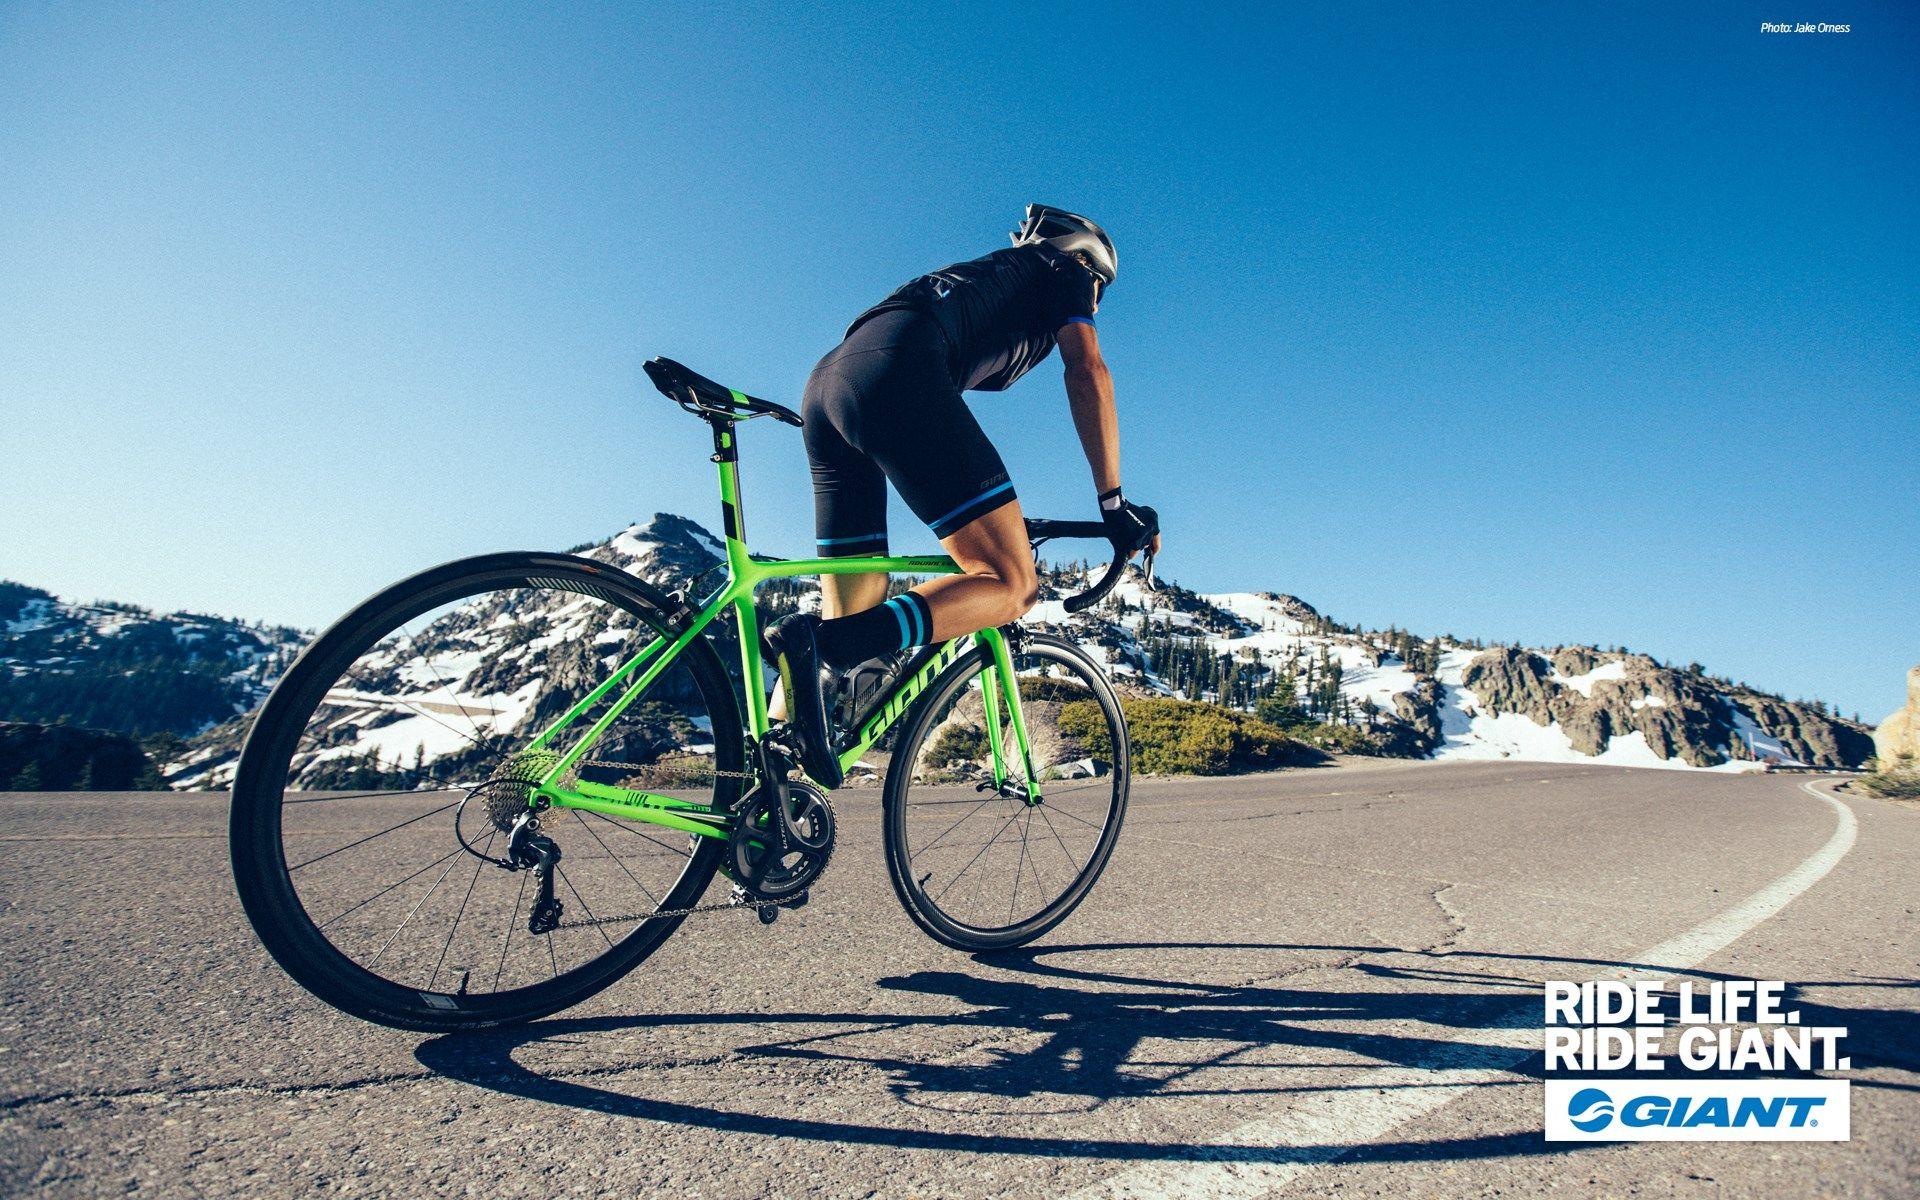 Giant Bike Wallpapers For Iphone In 2020 Giant Bikes Iphone Wallpaper Bike